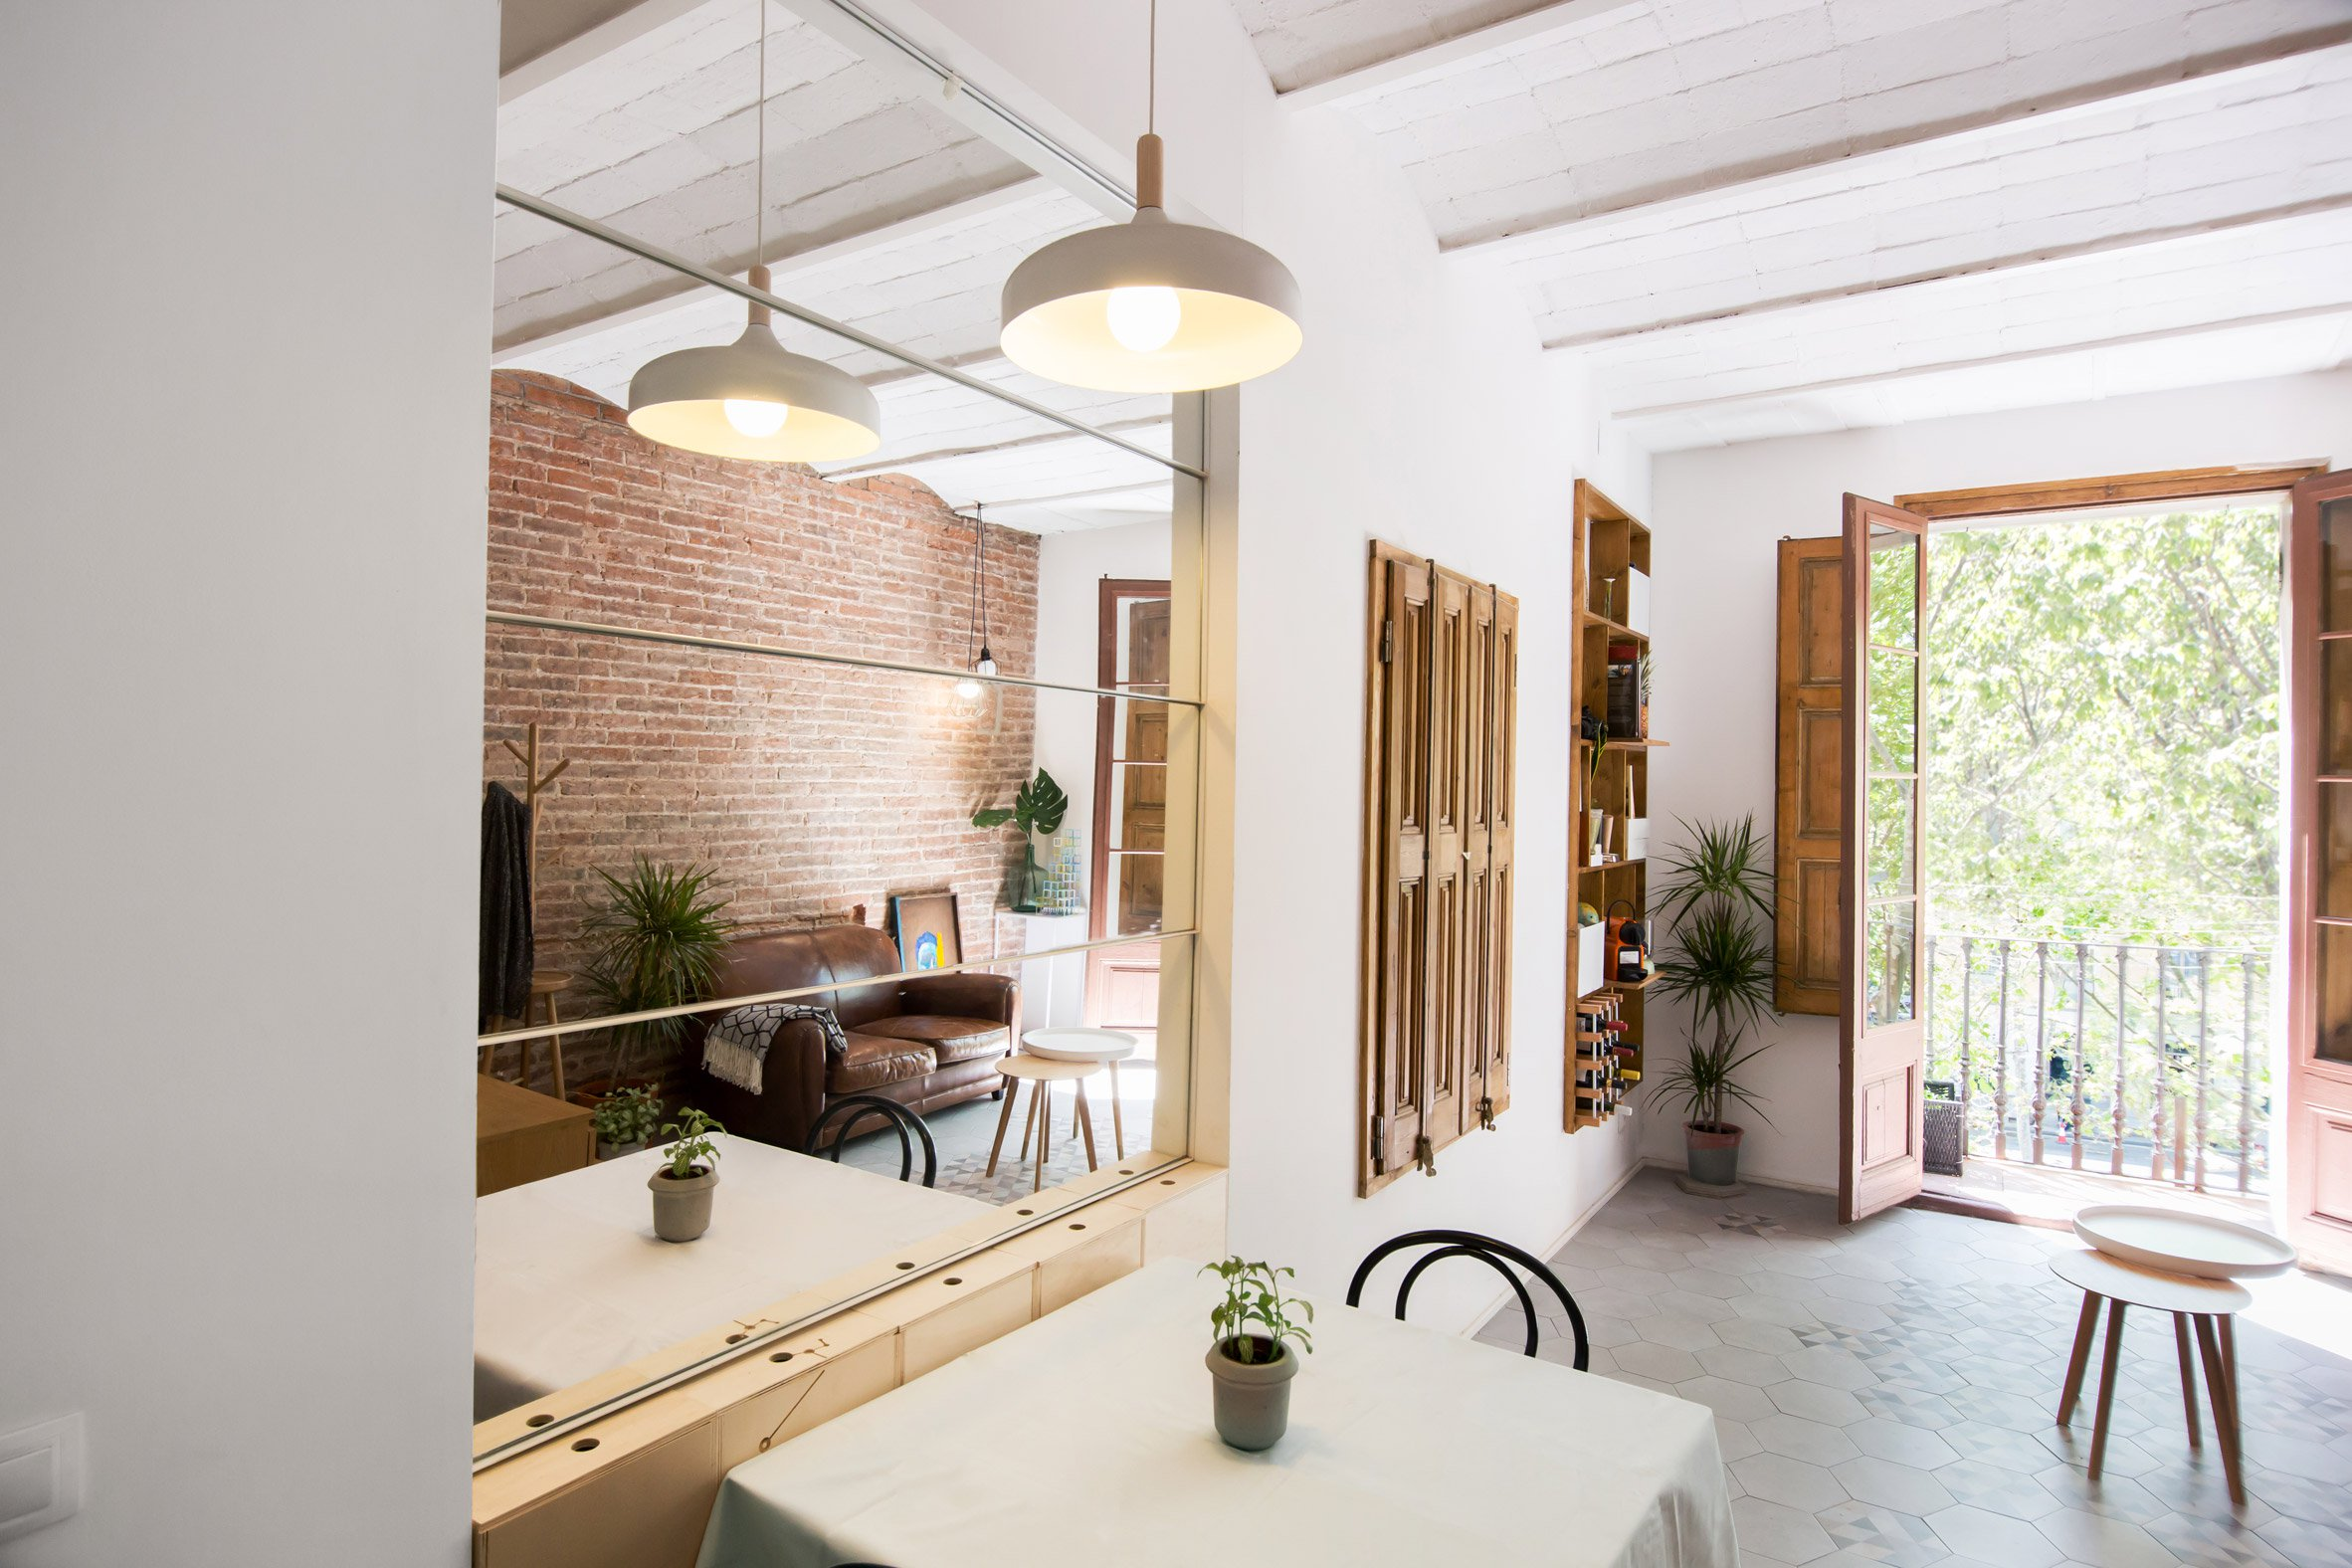 architecture-25m2-loft-interior-design-studia-osnovadesign-osnova-poltava_04